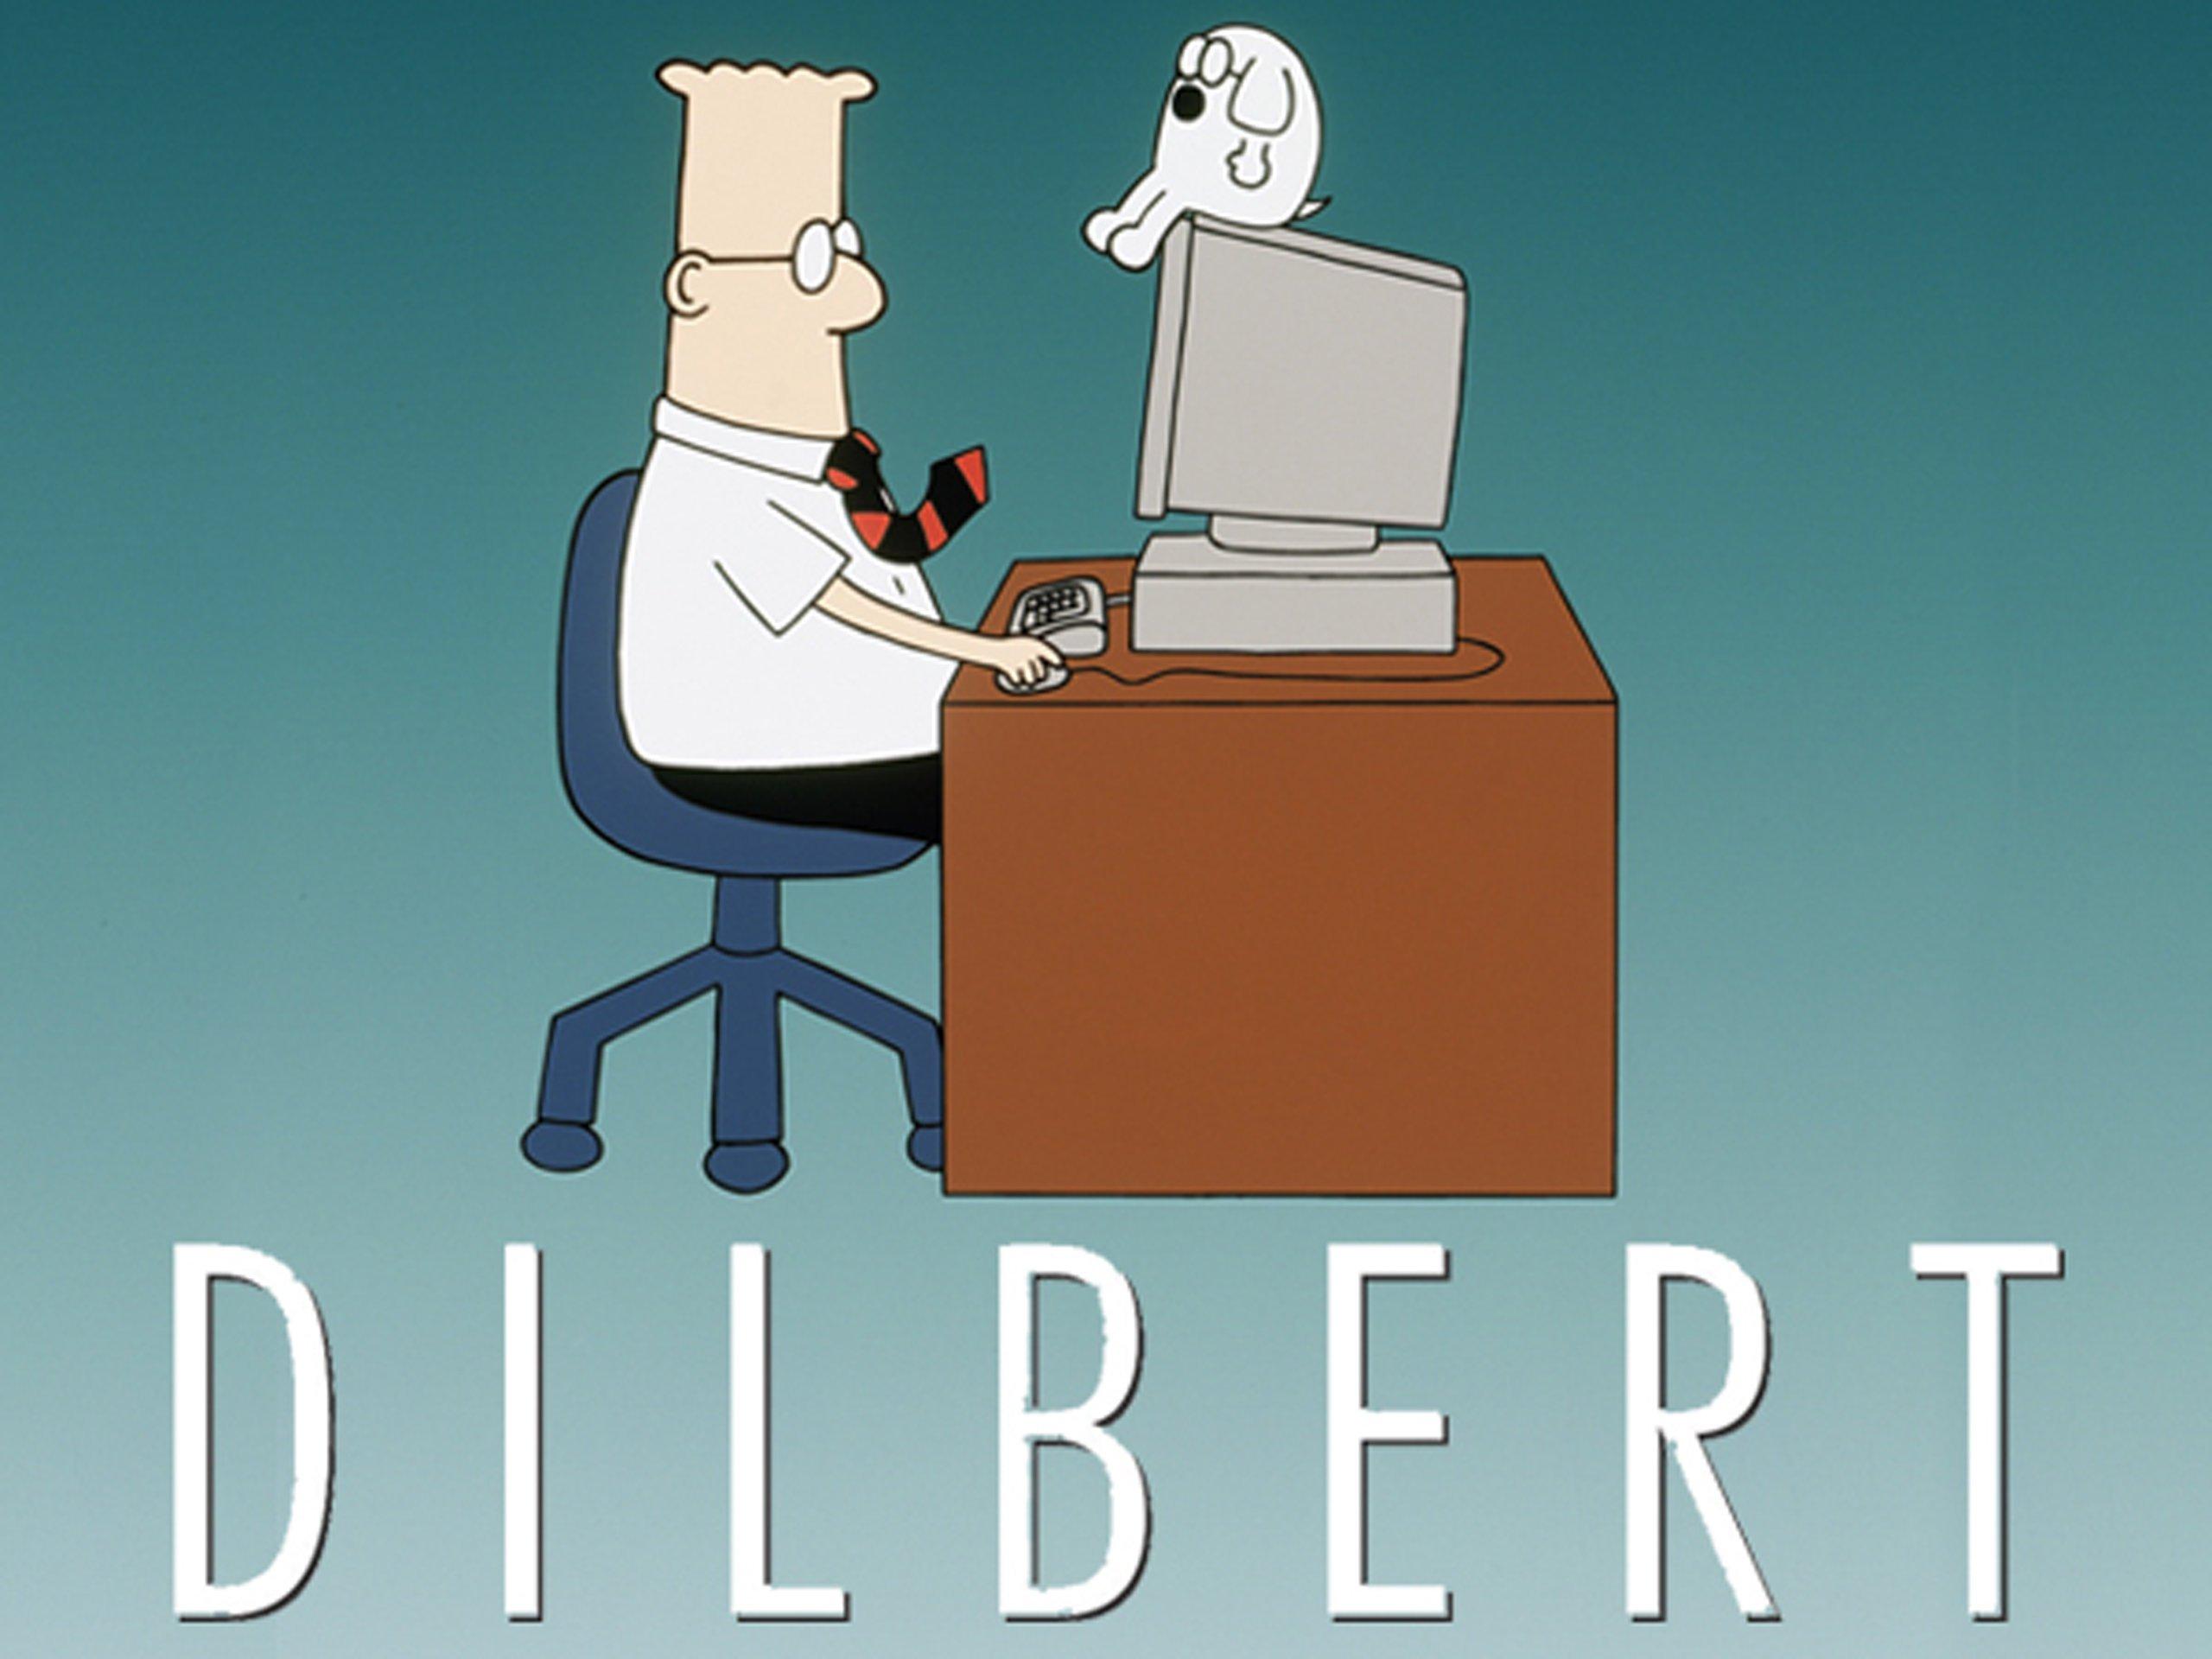 dilbert episodes free